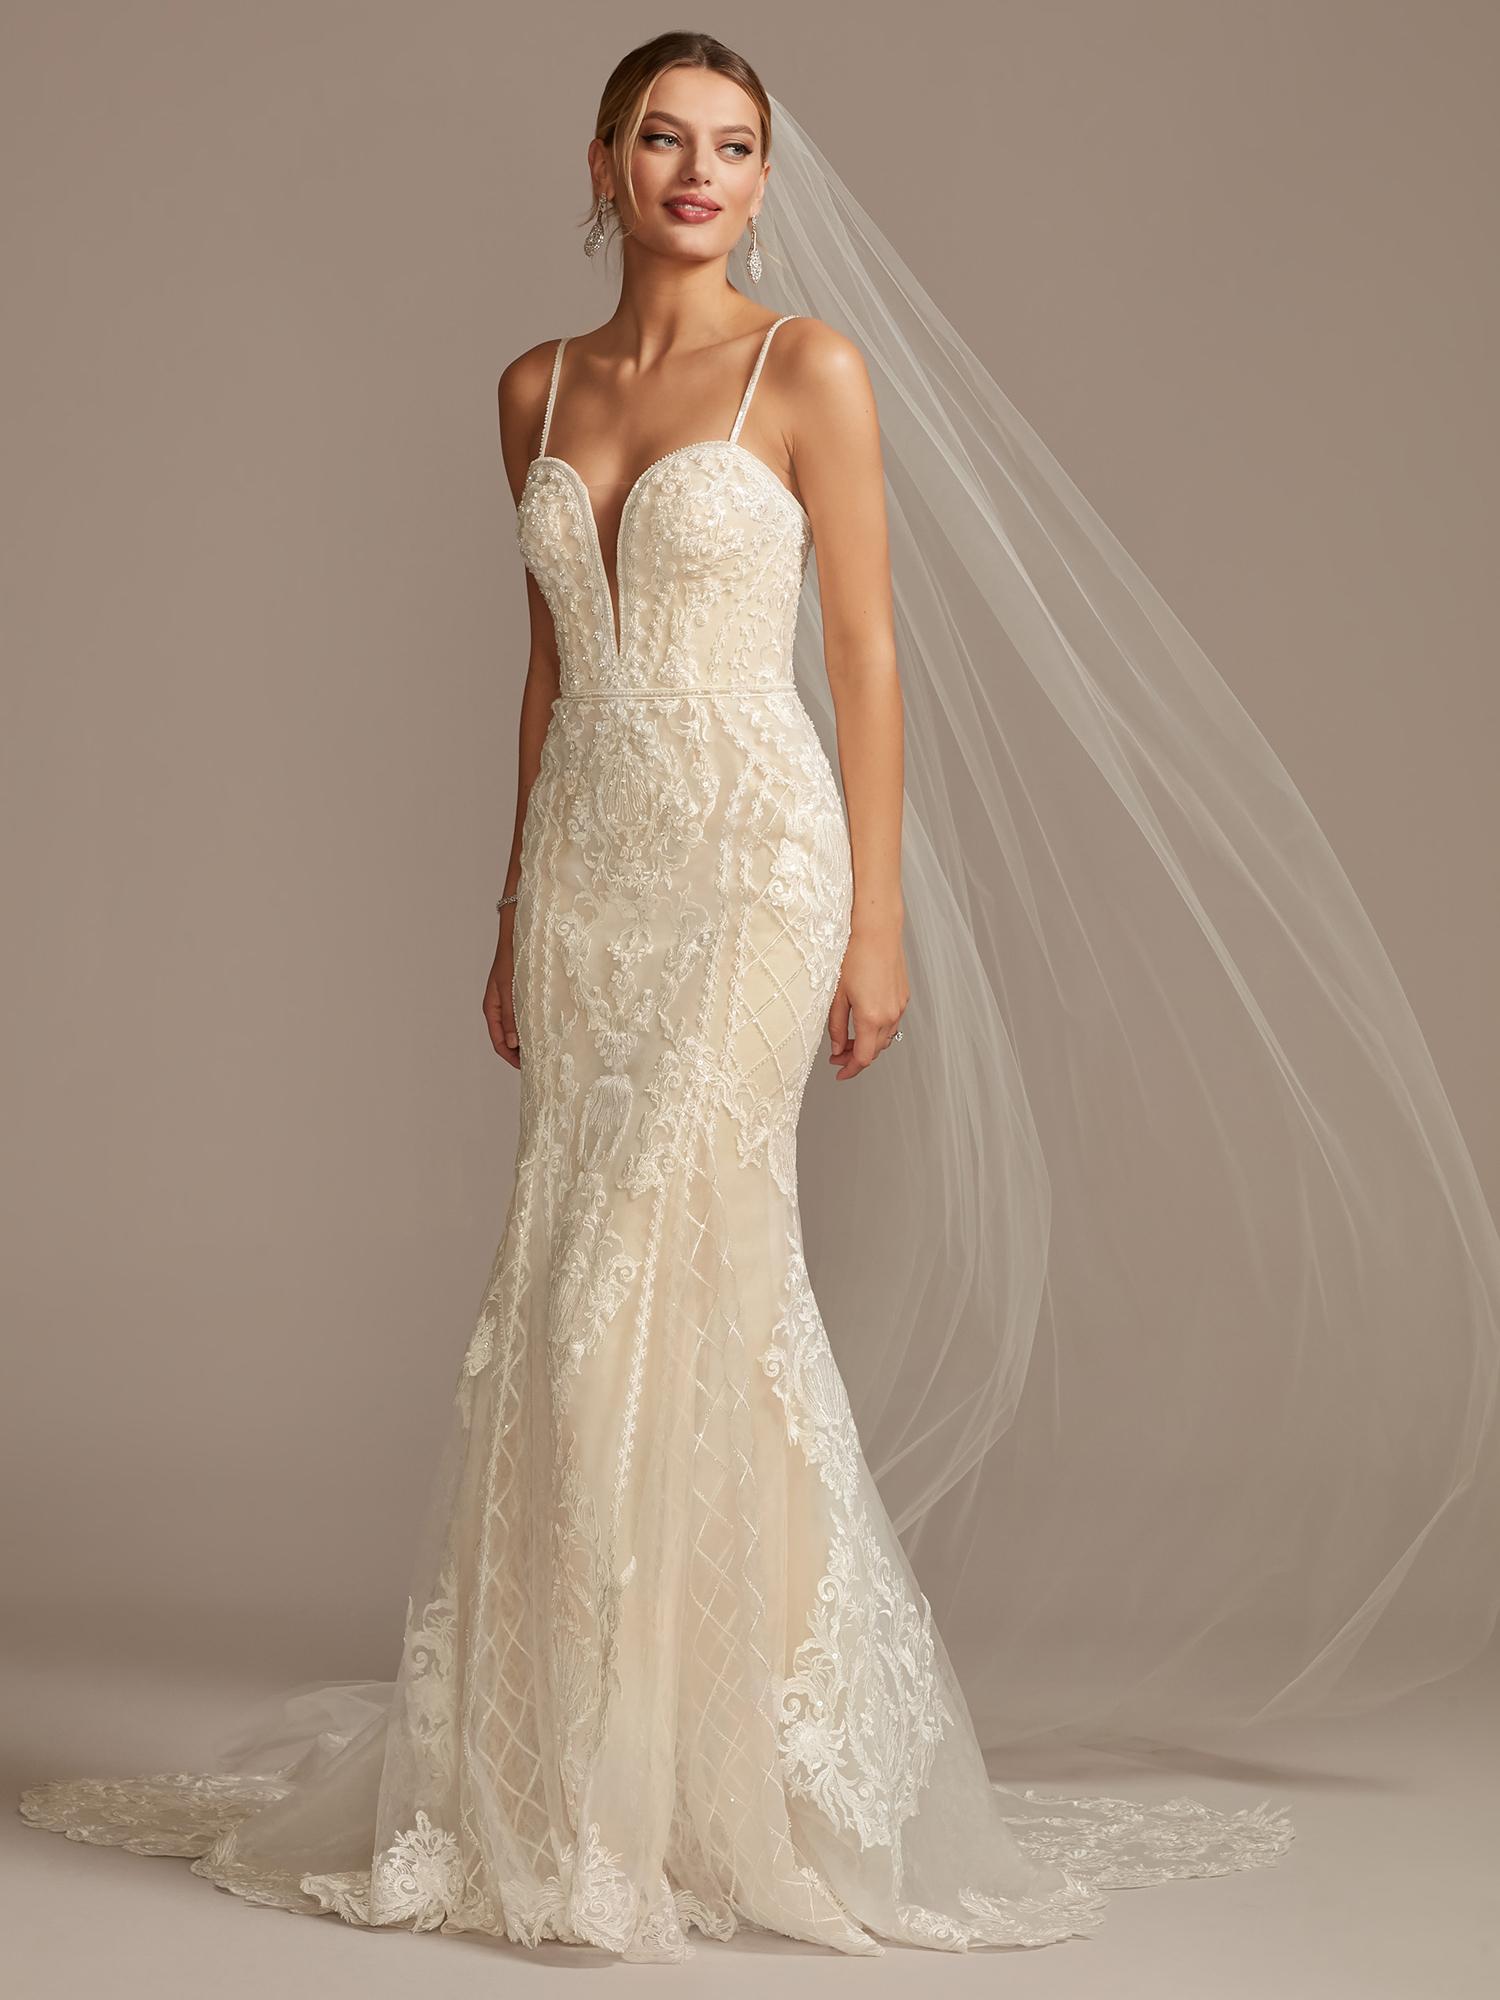 davids bridal plunging v-neck thin strap lace wedding dress spring 2021